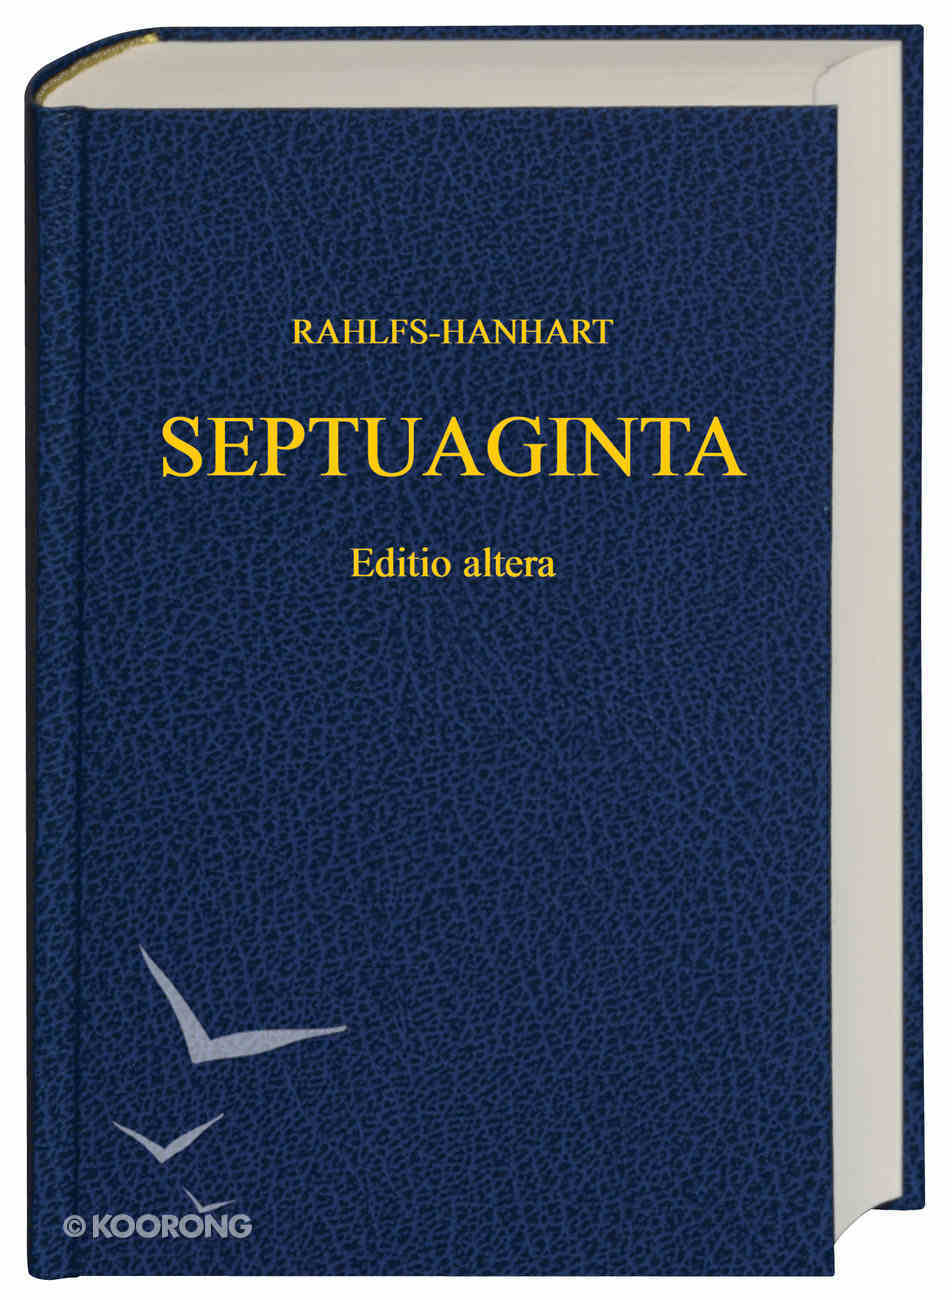 Rahlfs-Hanhart Septuaginta (2006) Hardback